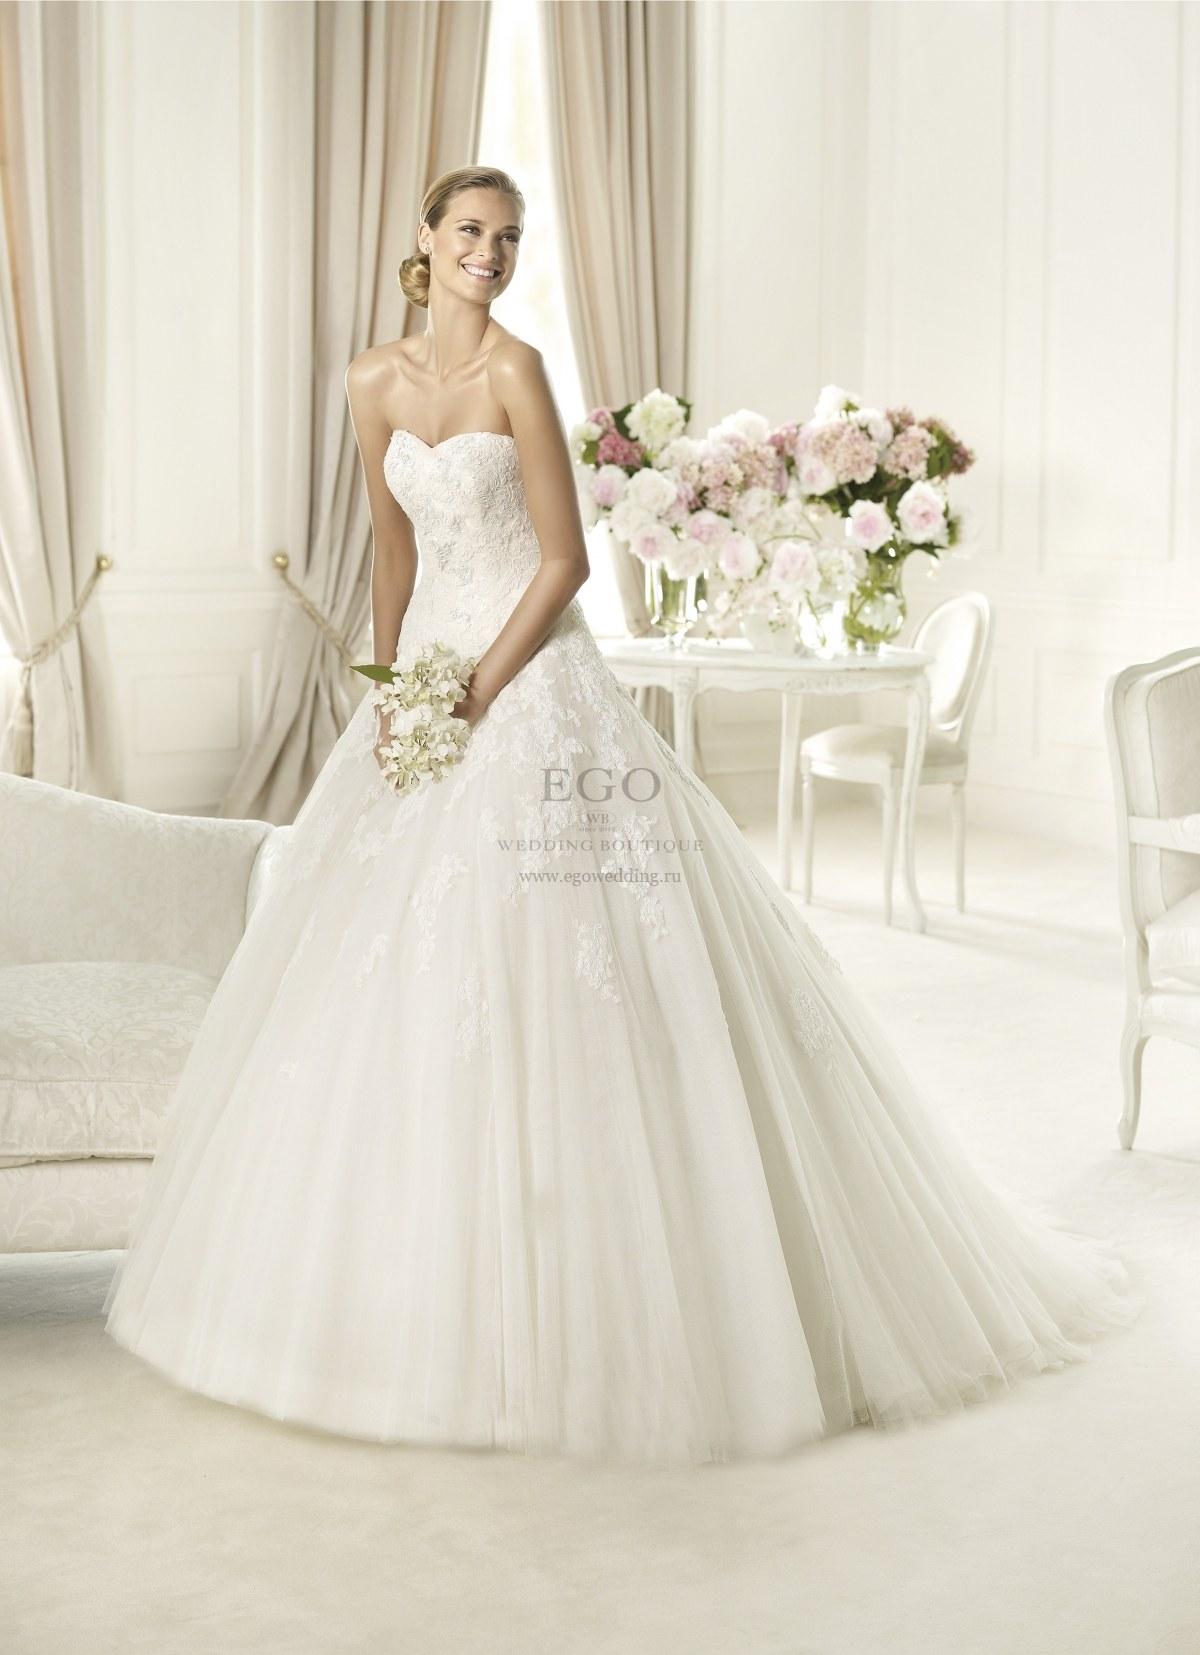 Благородное Платье Ddtrnysq Dshtp 117